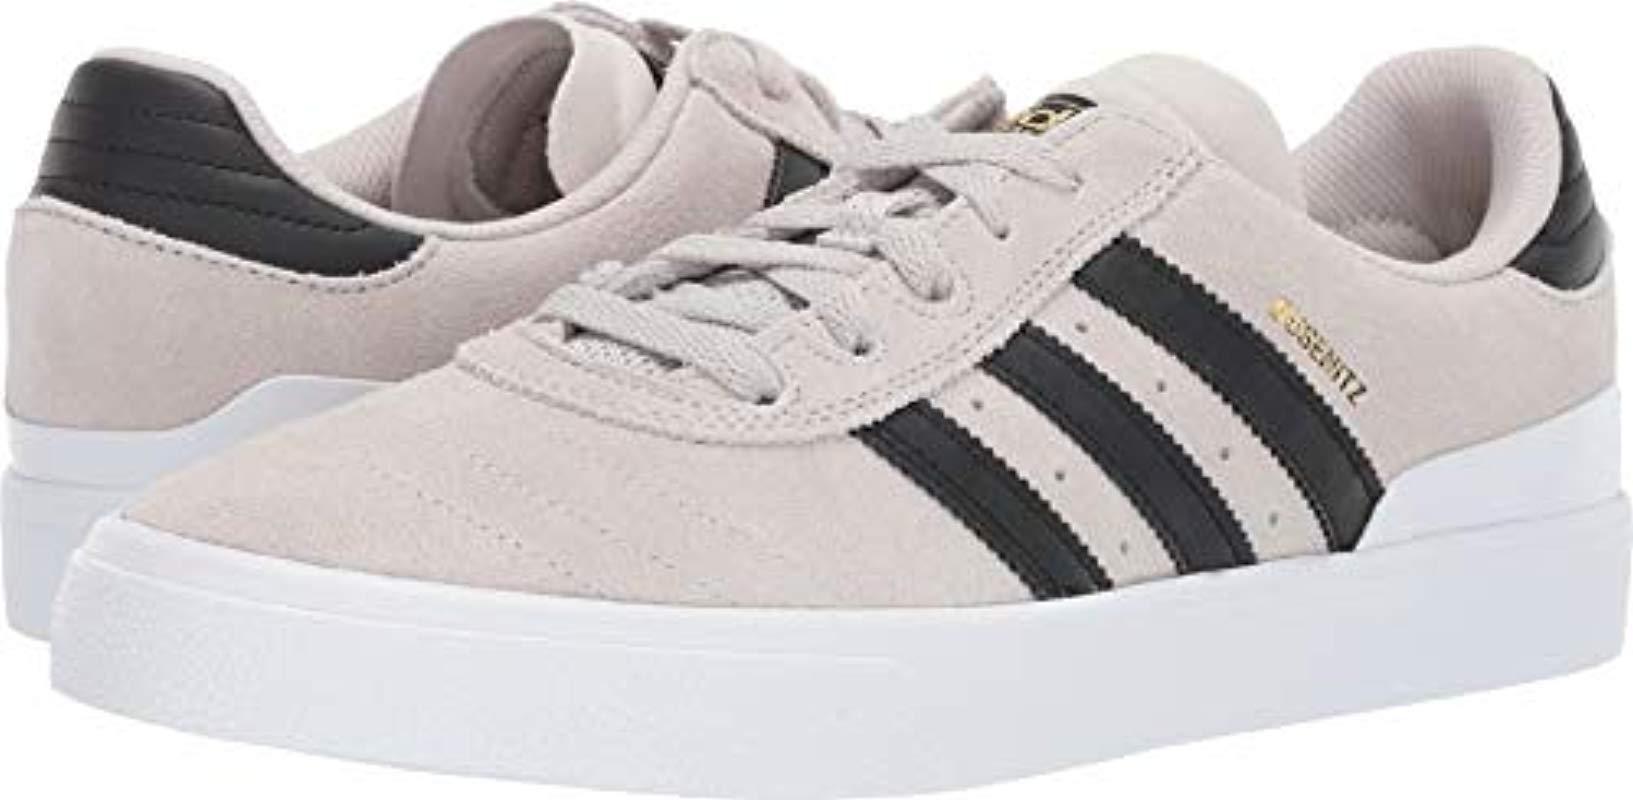 big sale 4c18c 222c8 adidas Originals. Men s White Busenitz Vulc Adv Fashion Sneaker